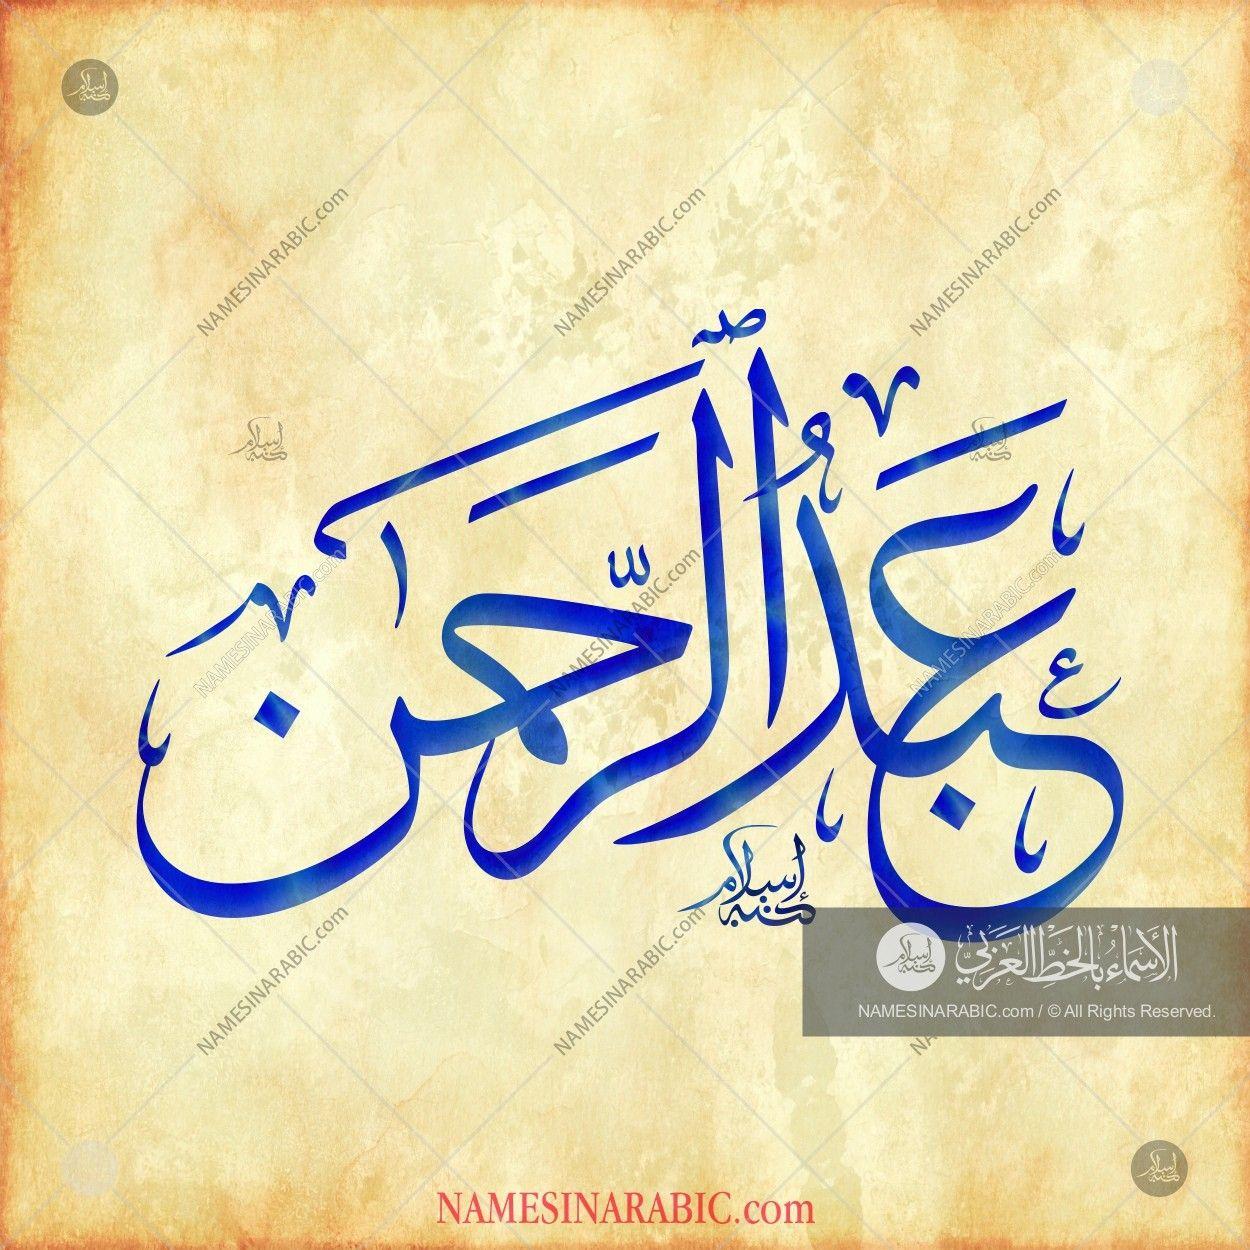 Abdul Rahman Name In Arabic Calligraphy Arabic Calligraphy Design Calligraphy Calligraphy Design